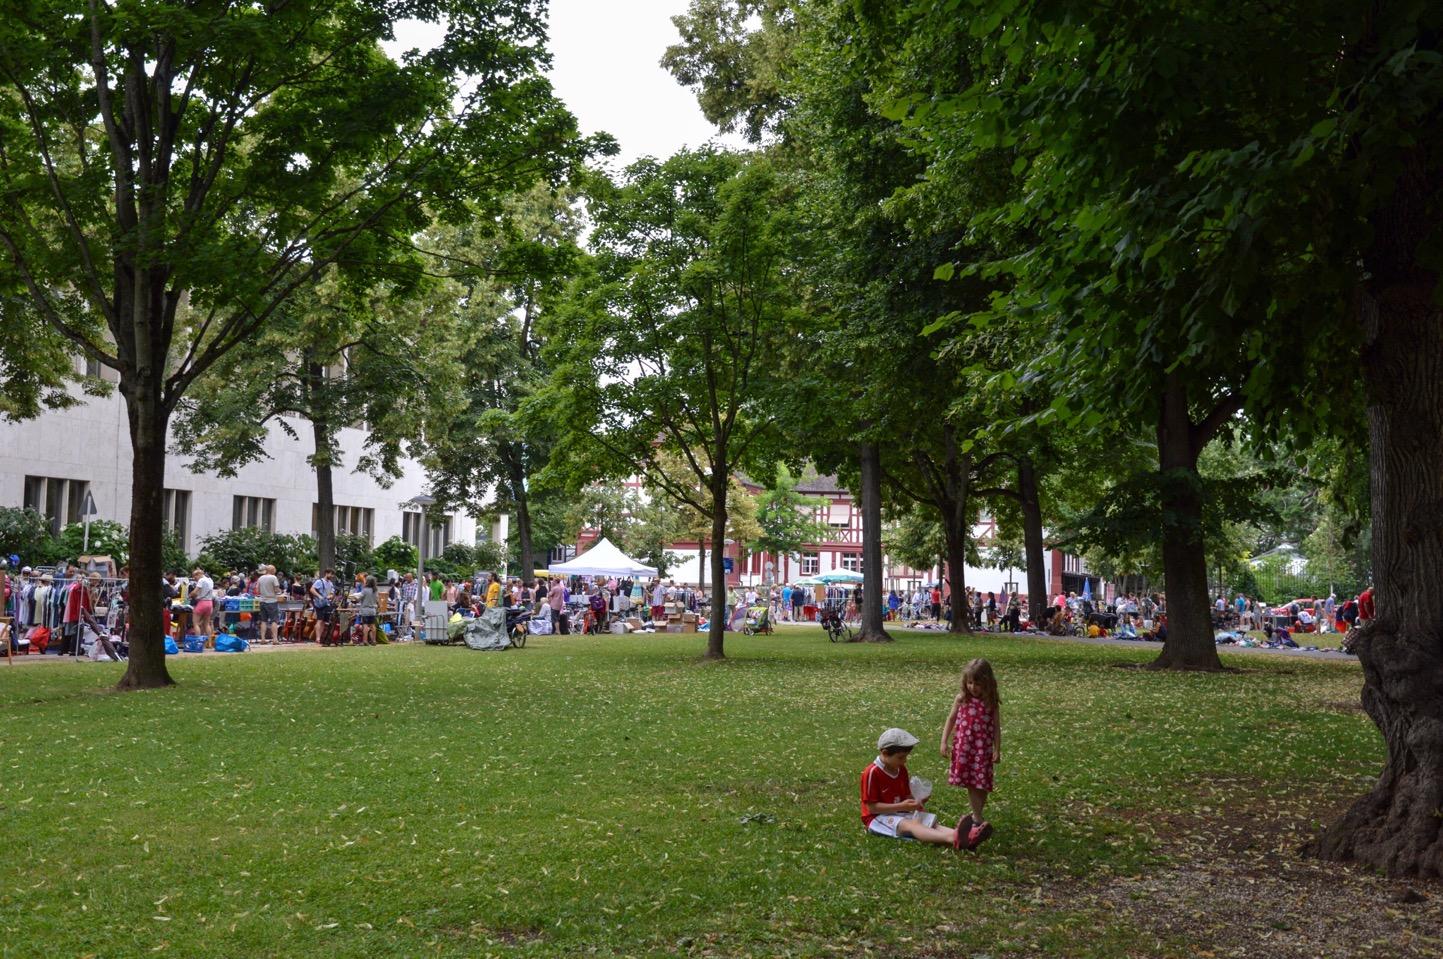 Flea market at Petersplatz, Basel, Switzerland